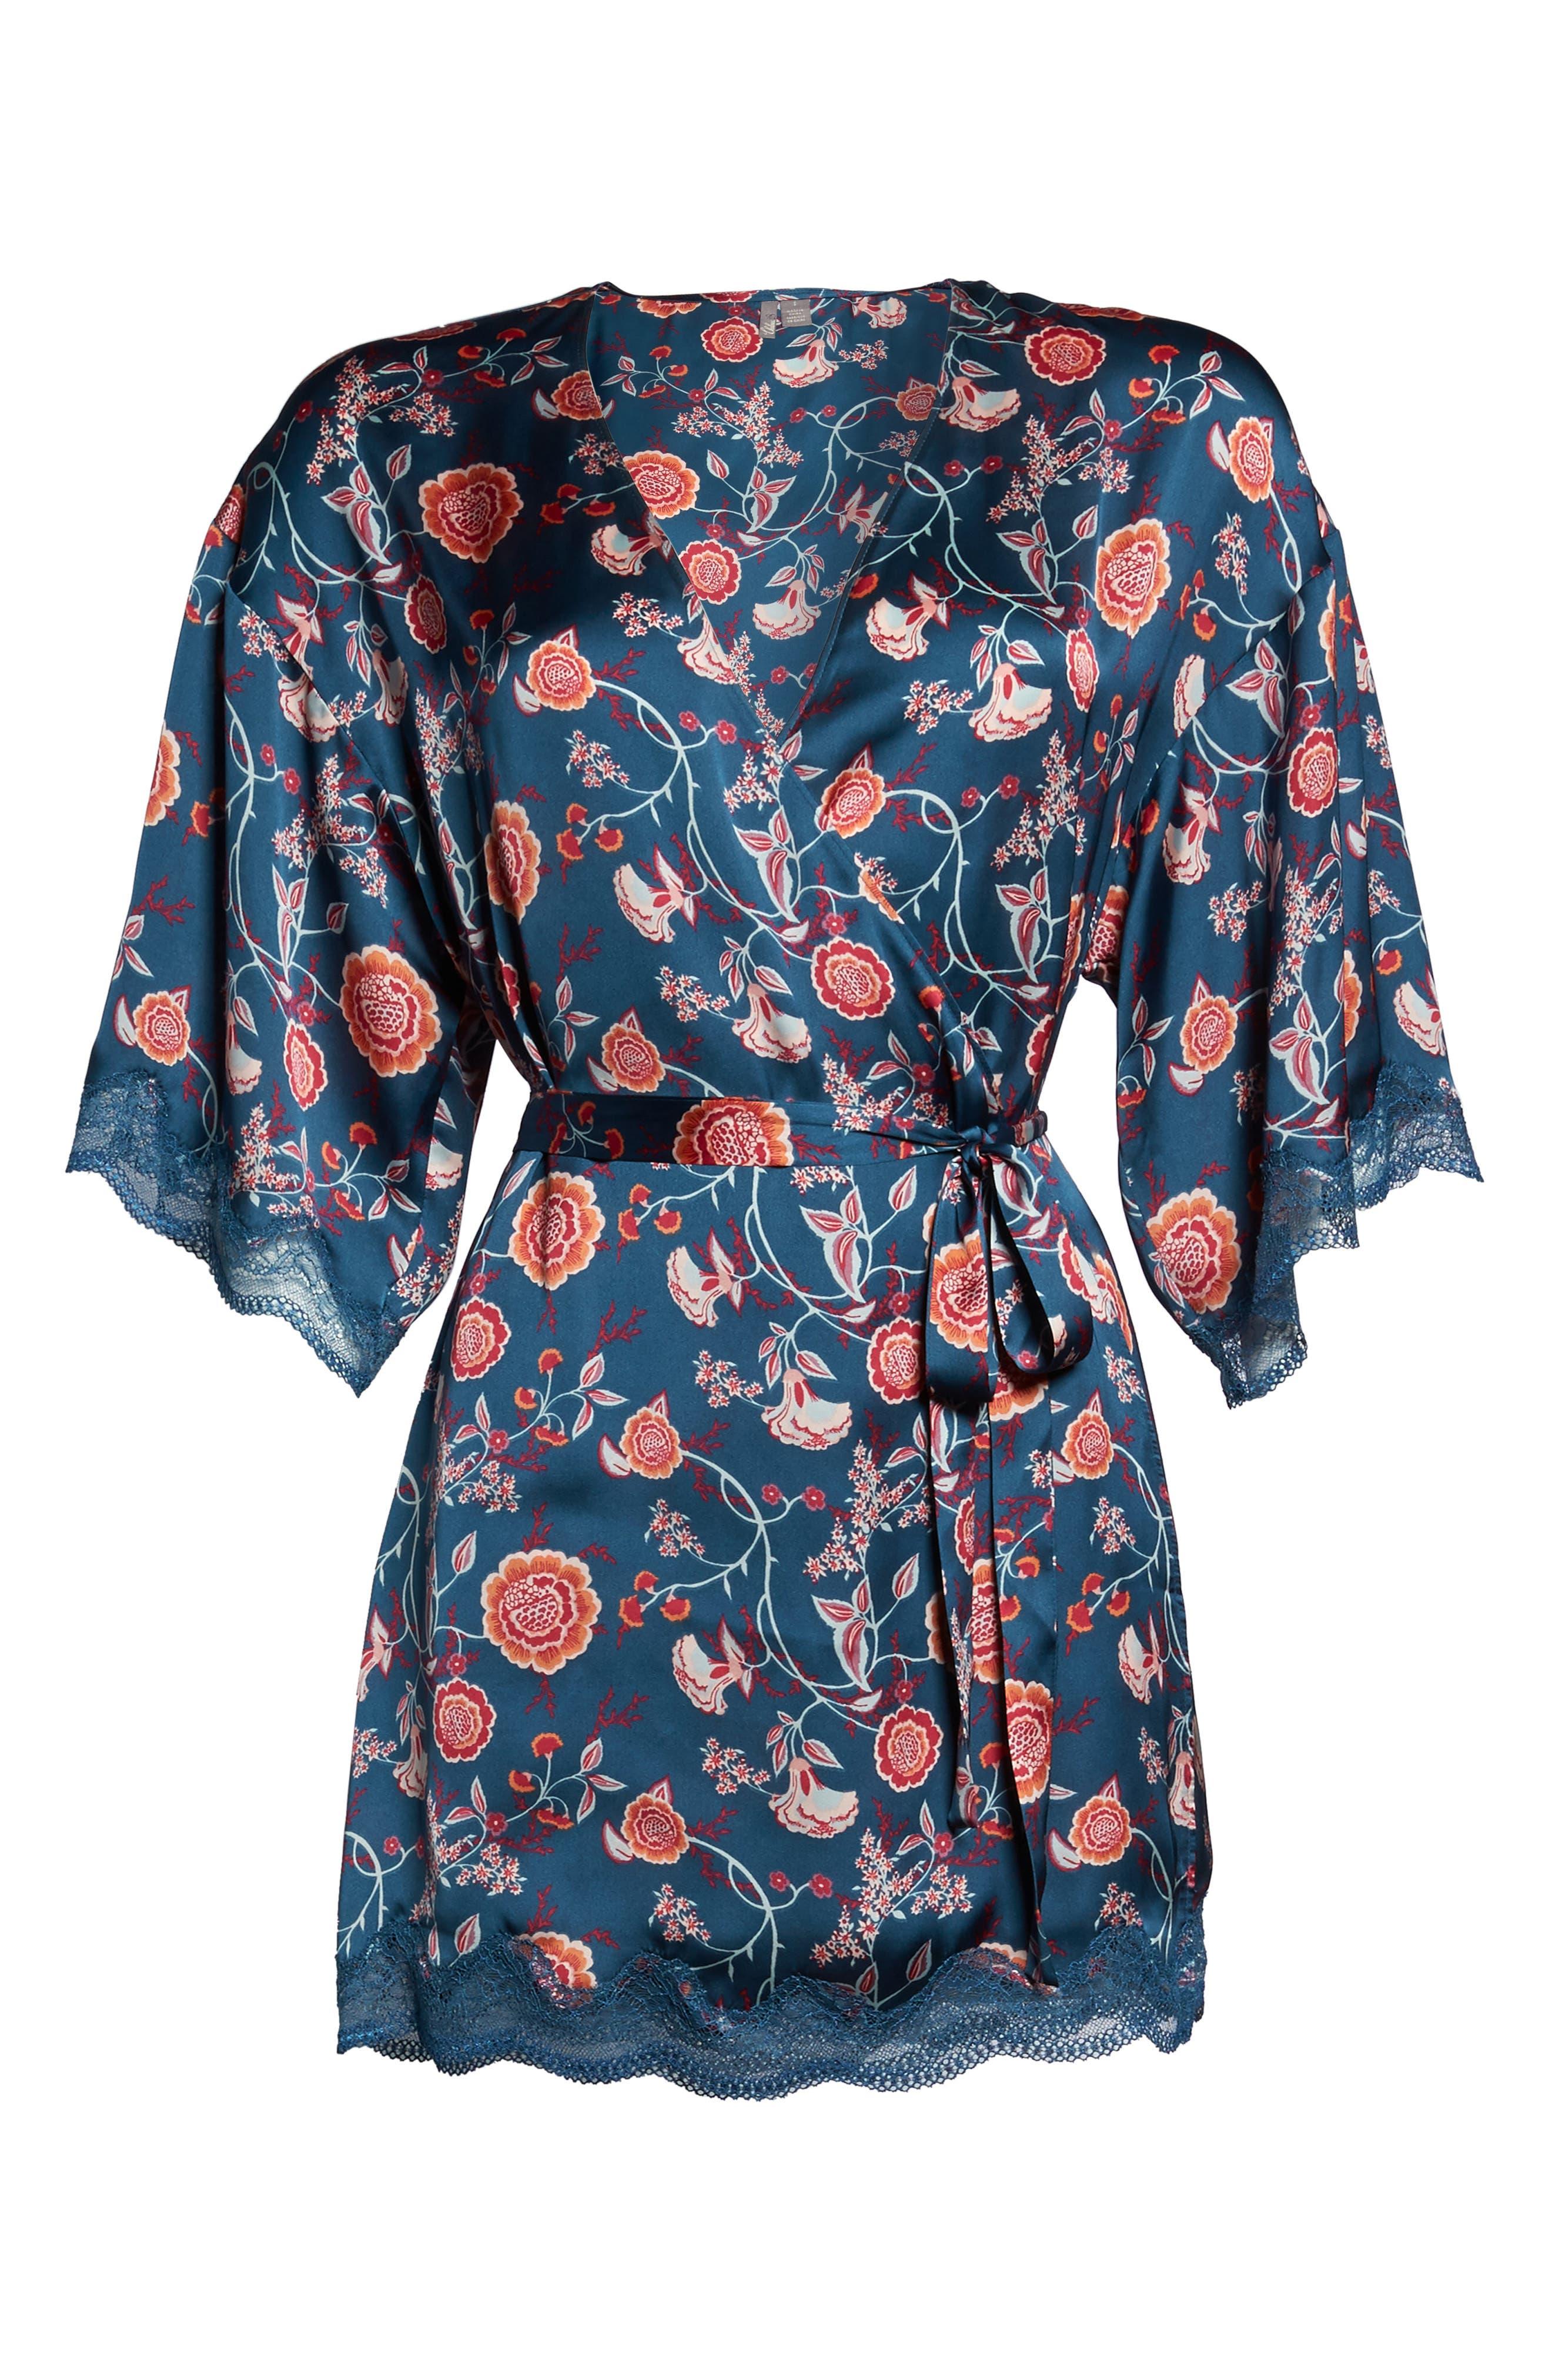 Floral Print Satin Kimono,                             Alternate thumbnail 4, color,                             Blue Ceramic Vintage Floral